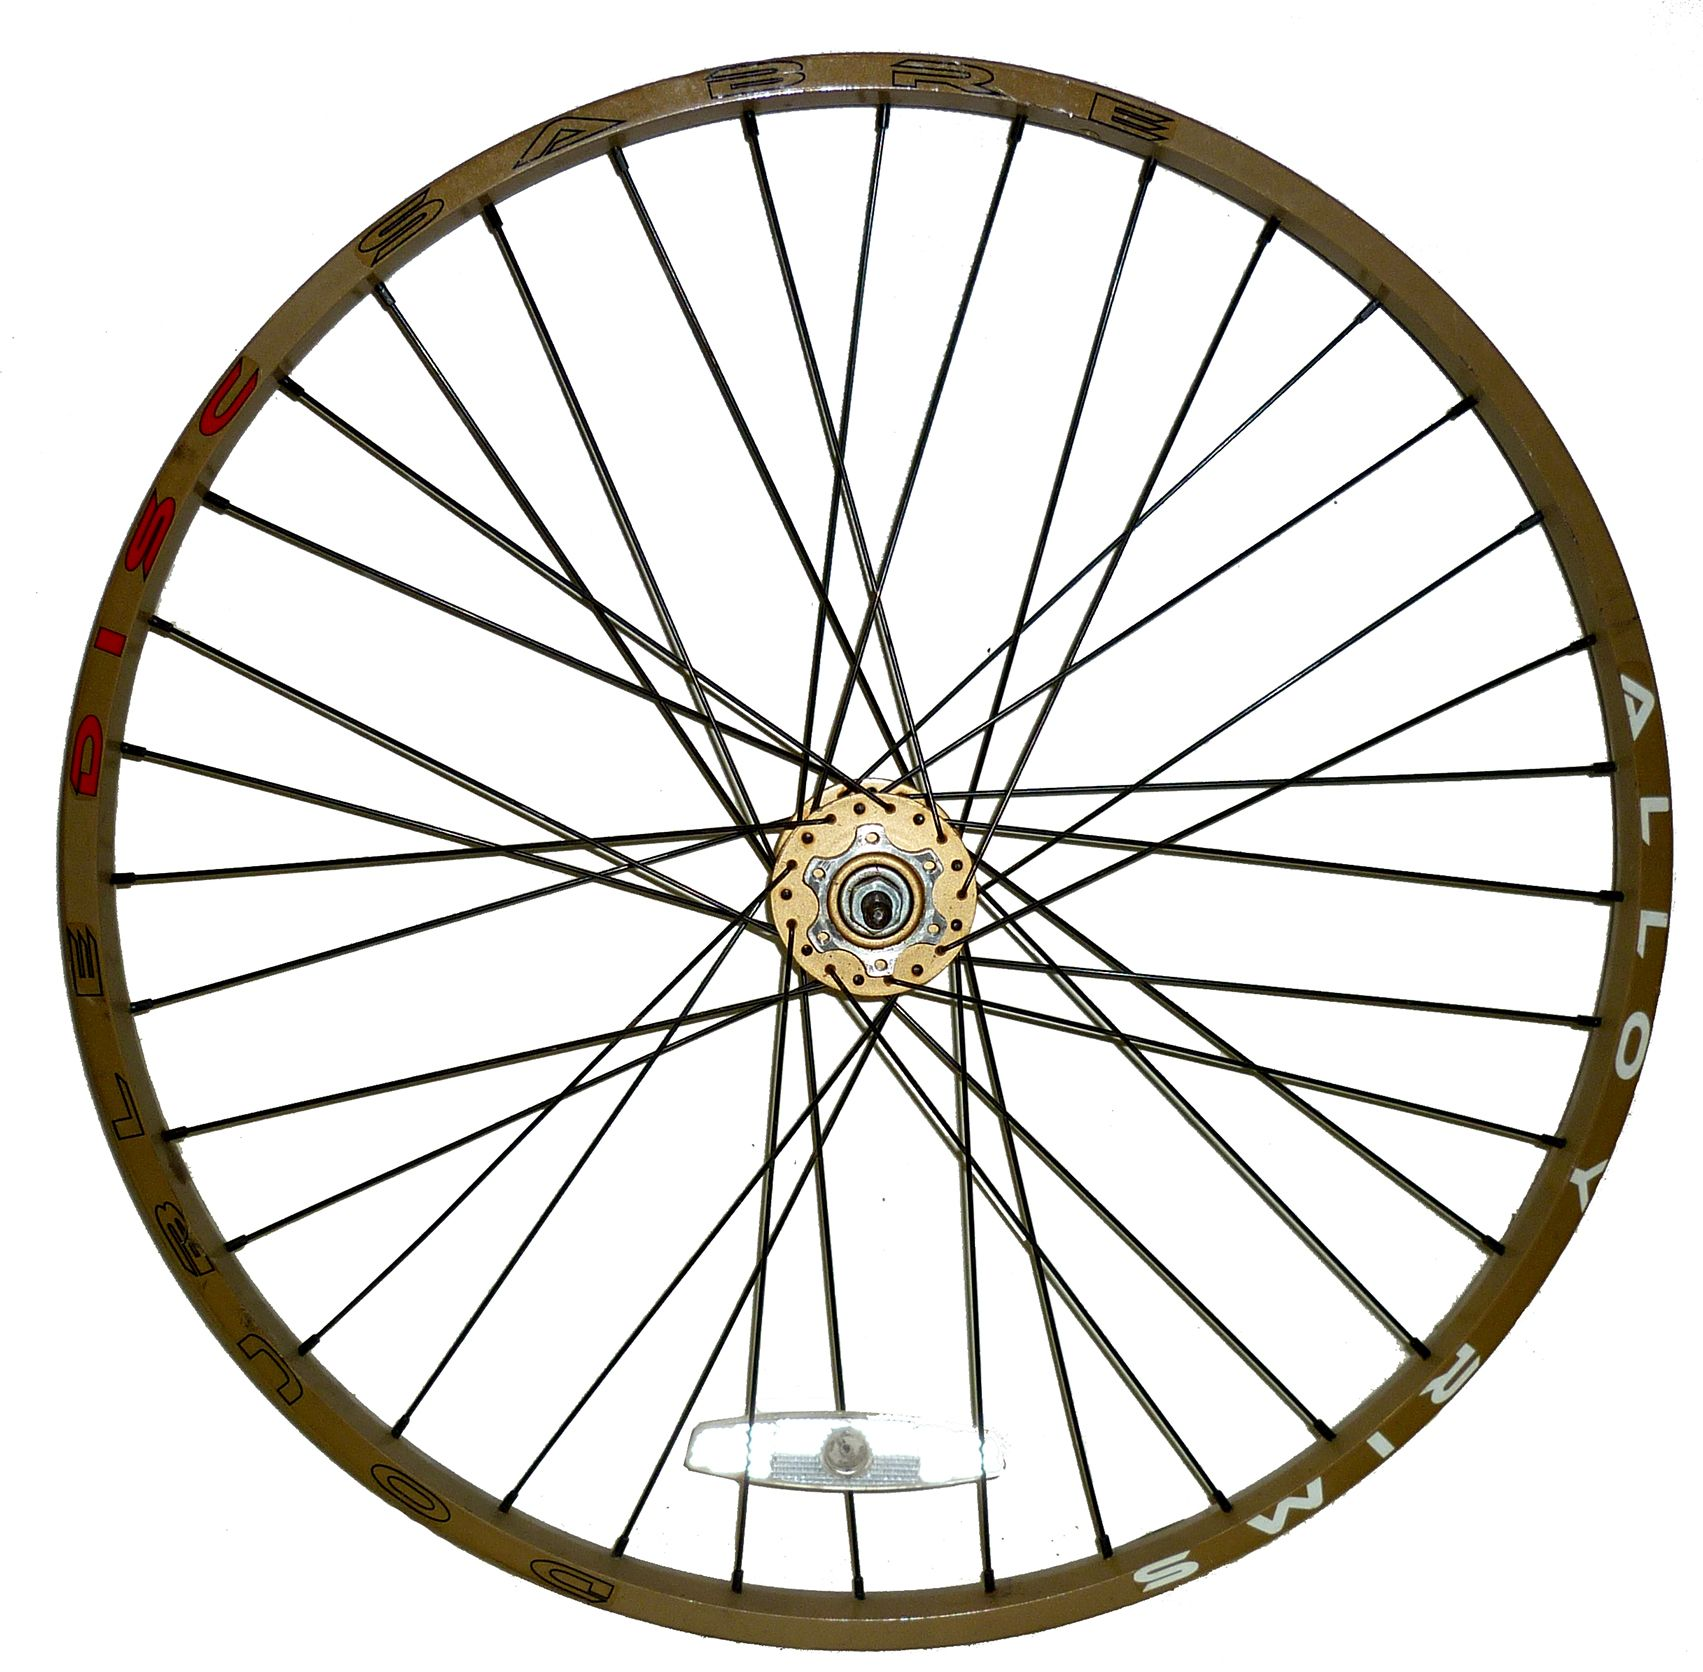 1703x1672 Saber 26 Front Mountain Bike Wheel Gold Disc Brake Black Spokes